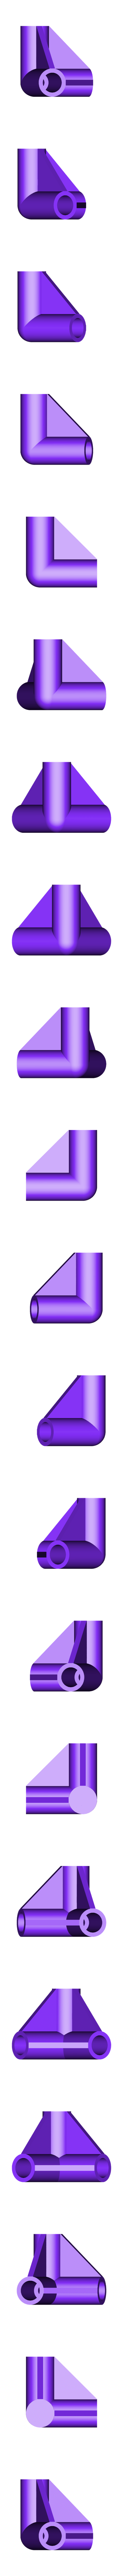 CornerPiece.stl Download free STL file Corner Piece • 3D print object, Lau85